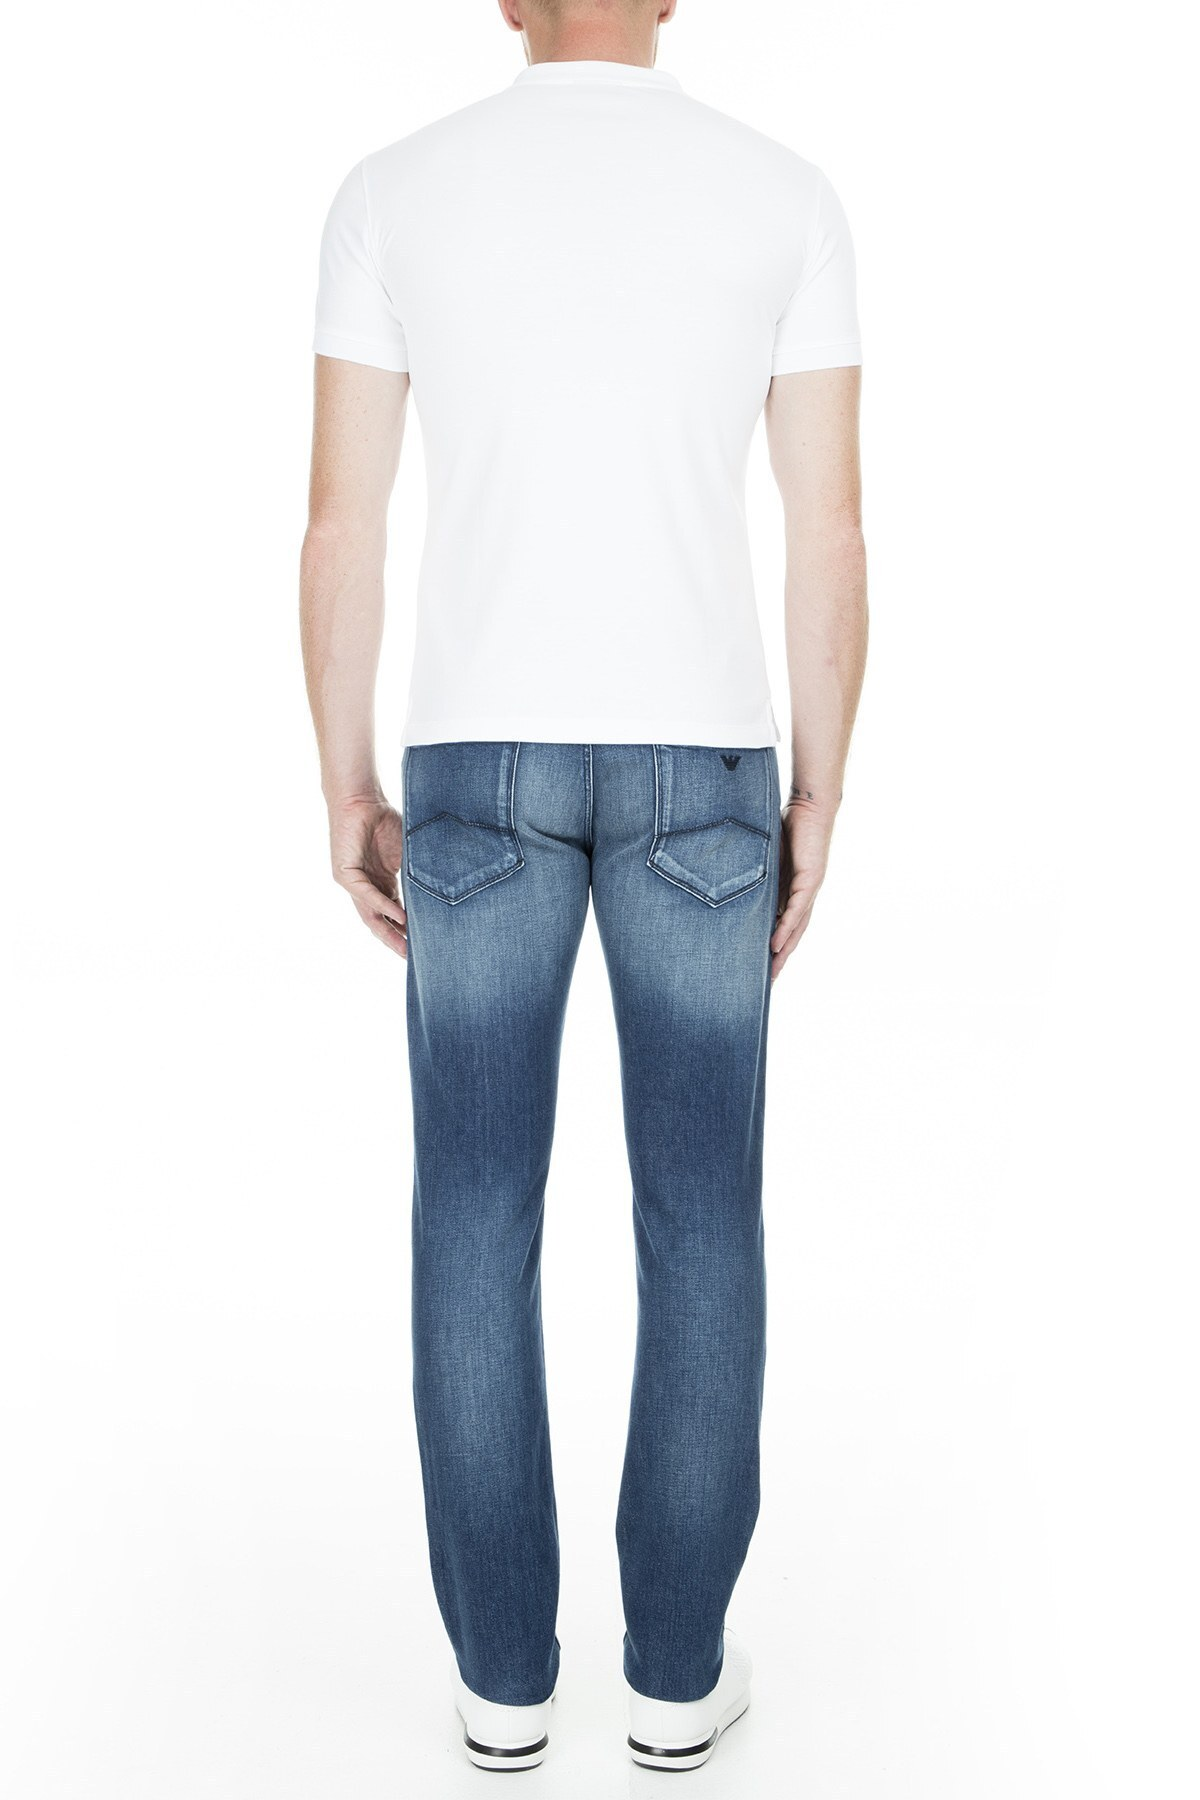 Emporio Armani J06 Jeans Erkek Kot Pantolon S 3G1J06 1D3ZZ 941 LACİVERT